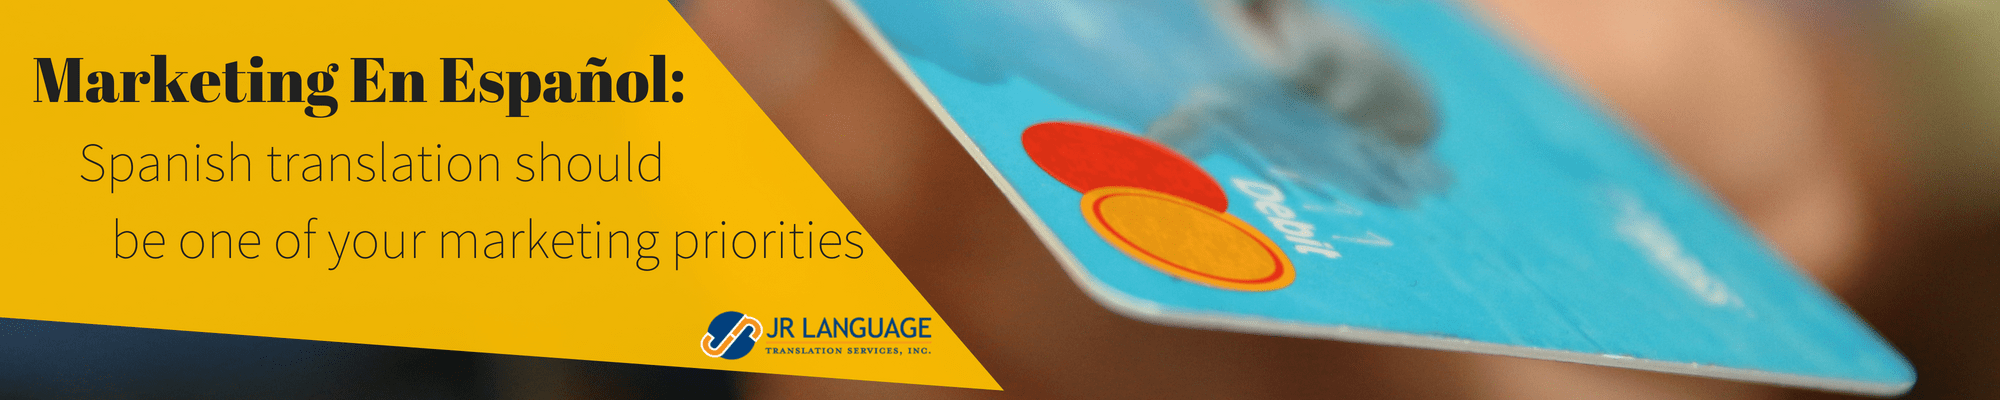 Importance of Spanish Translation in Marketing